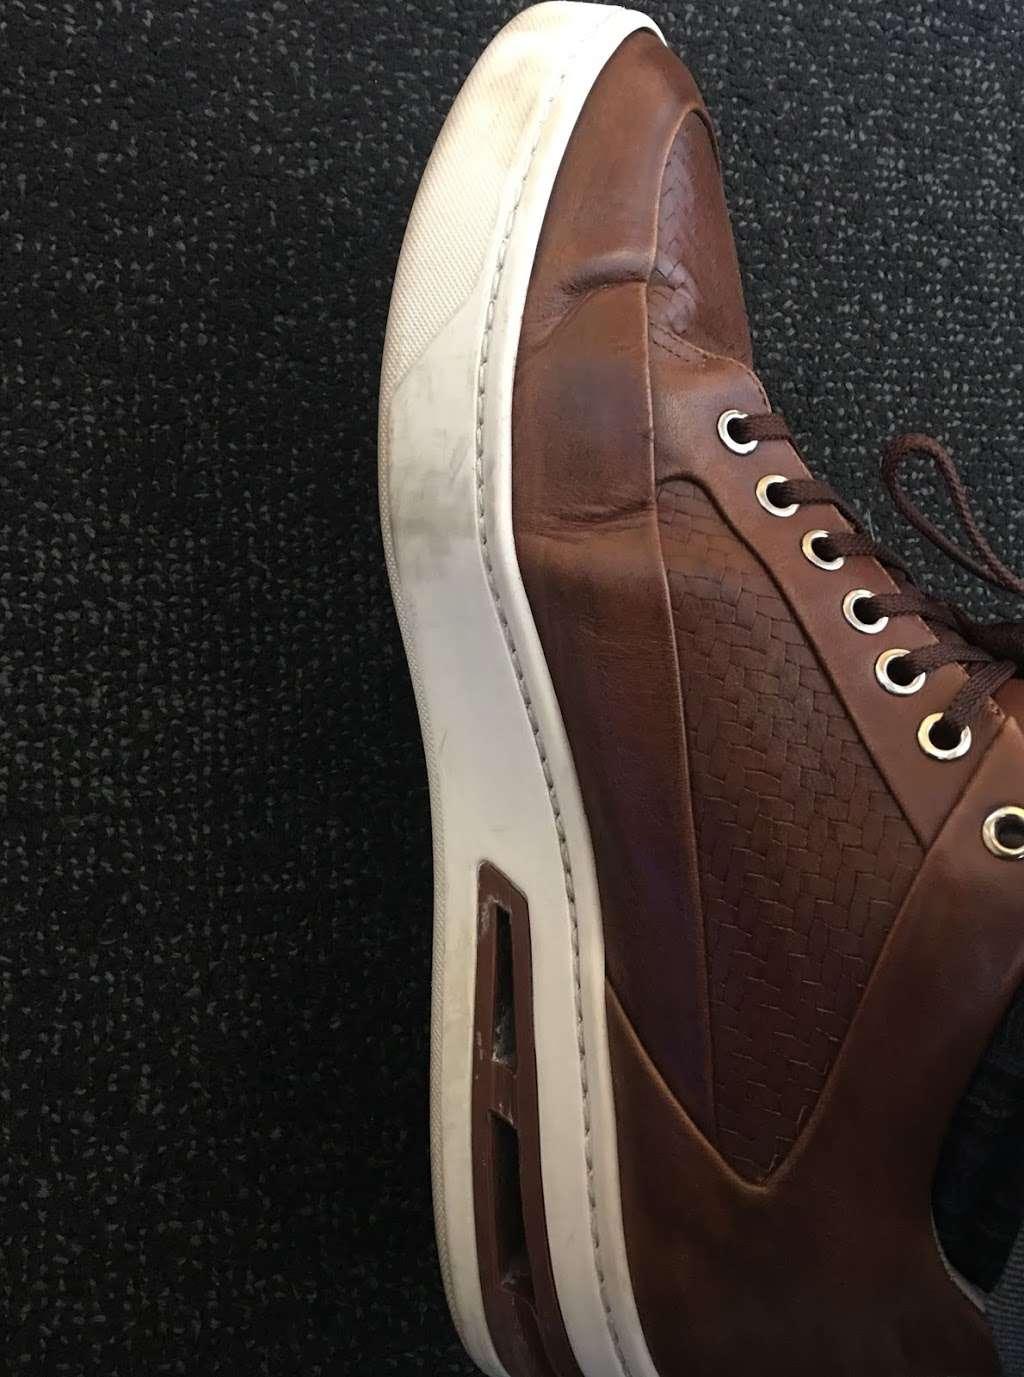 Harborside Dry Cleaners & Shoe Repair - laundry  | Photo 4 of 6 | Address: 34 Exchange Pl, Jersey City, NJ 07302, USA | Phone: (201) 333-7640